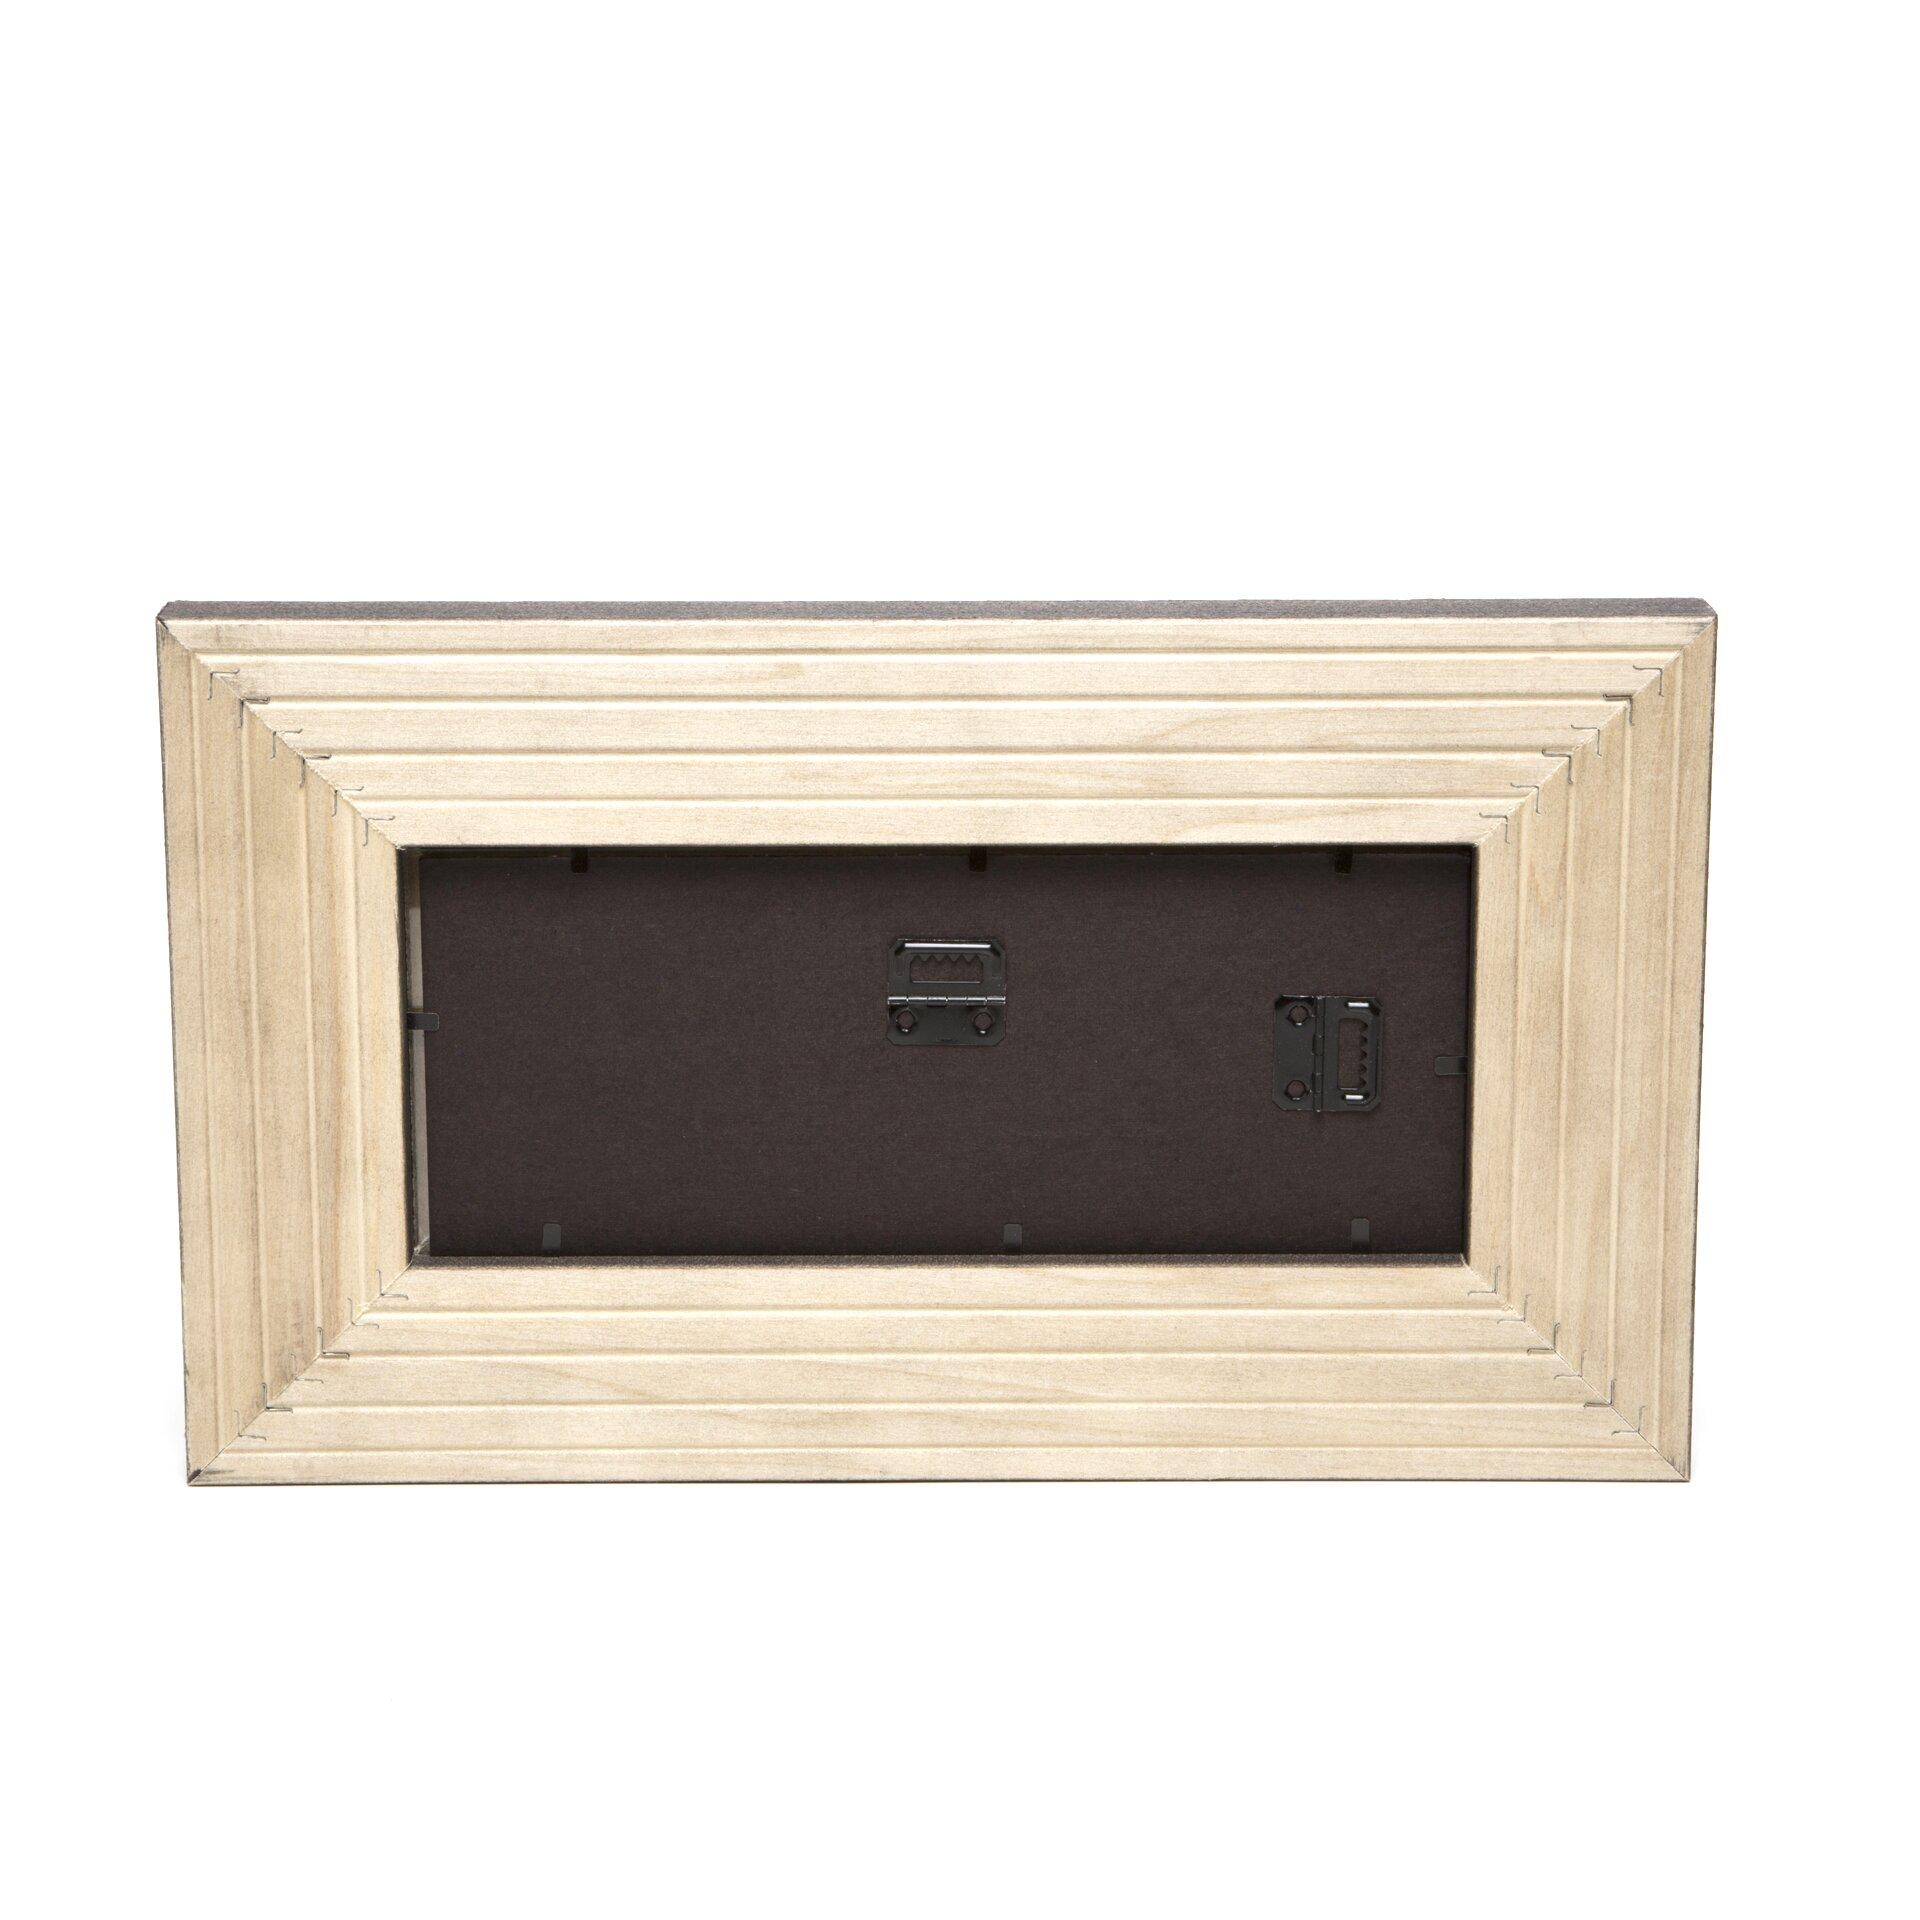 craig frames inc 25 wide distressed wood picture frame poster frame